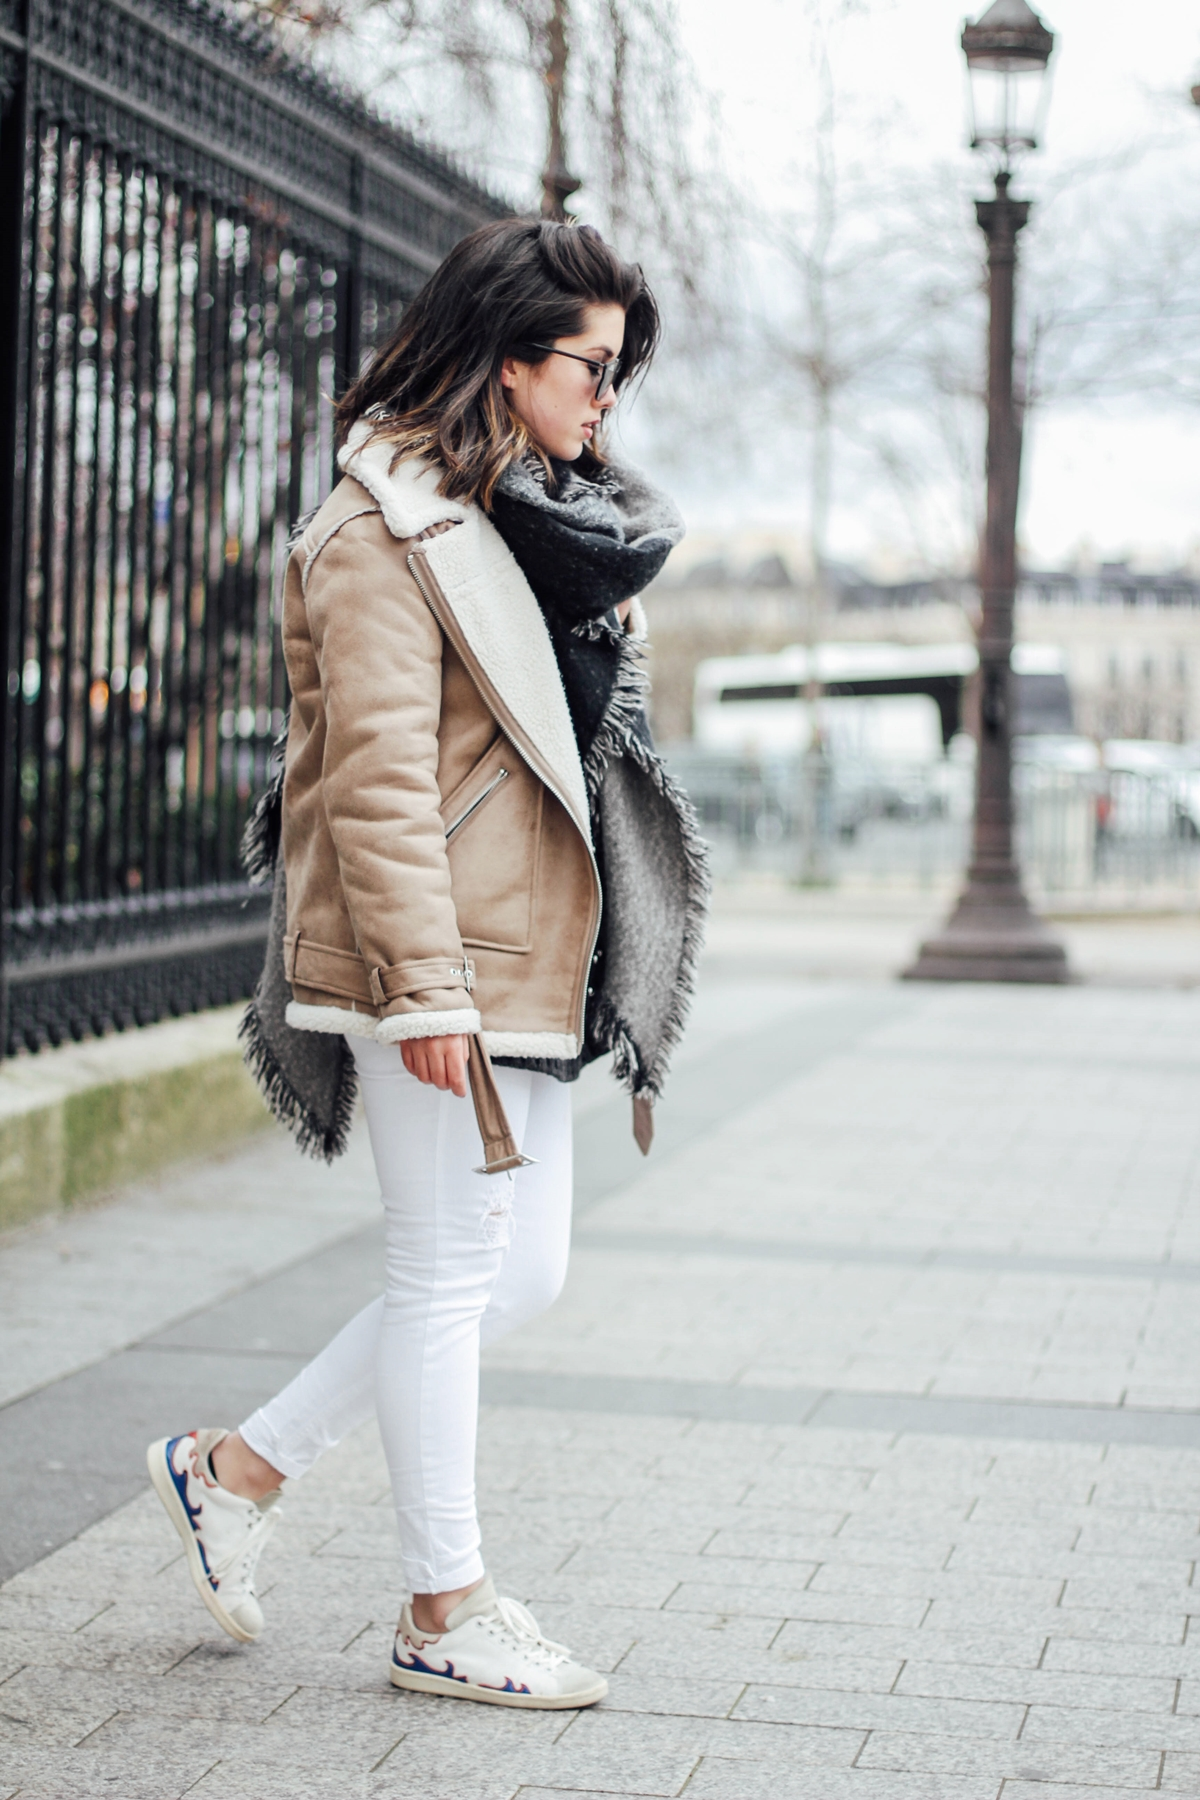 shearling-jacket-beige-isabel-marant-sneakers-streetstyle myblueberrynightsblog